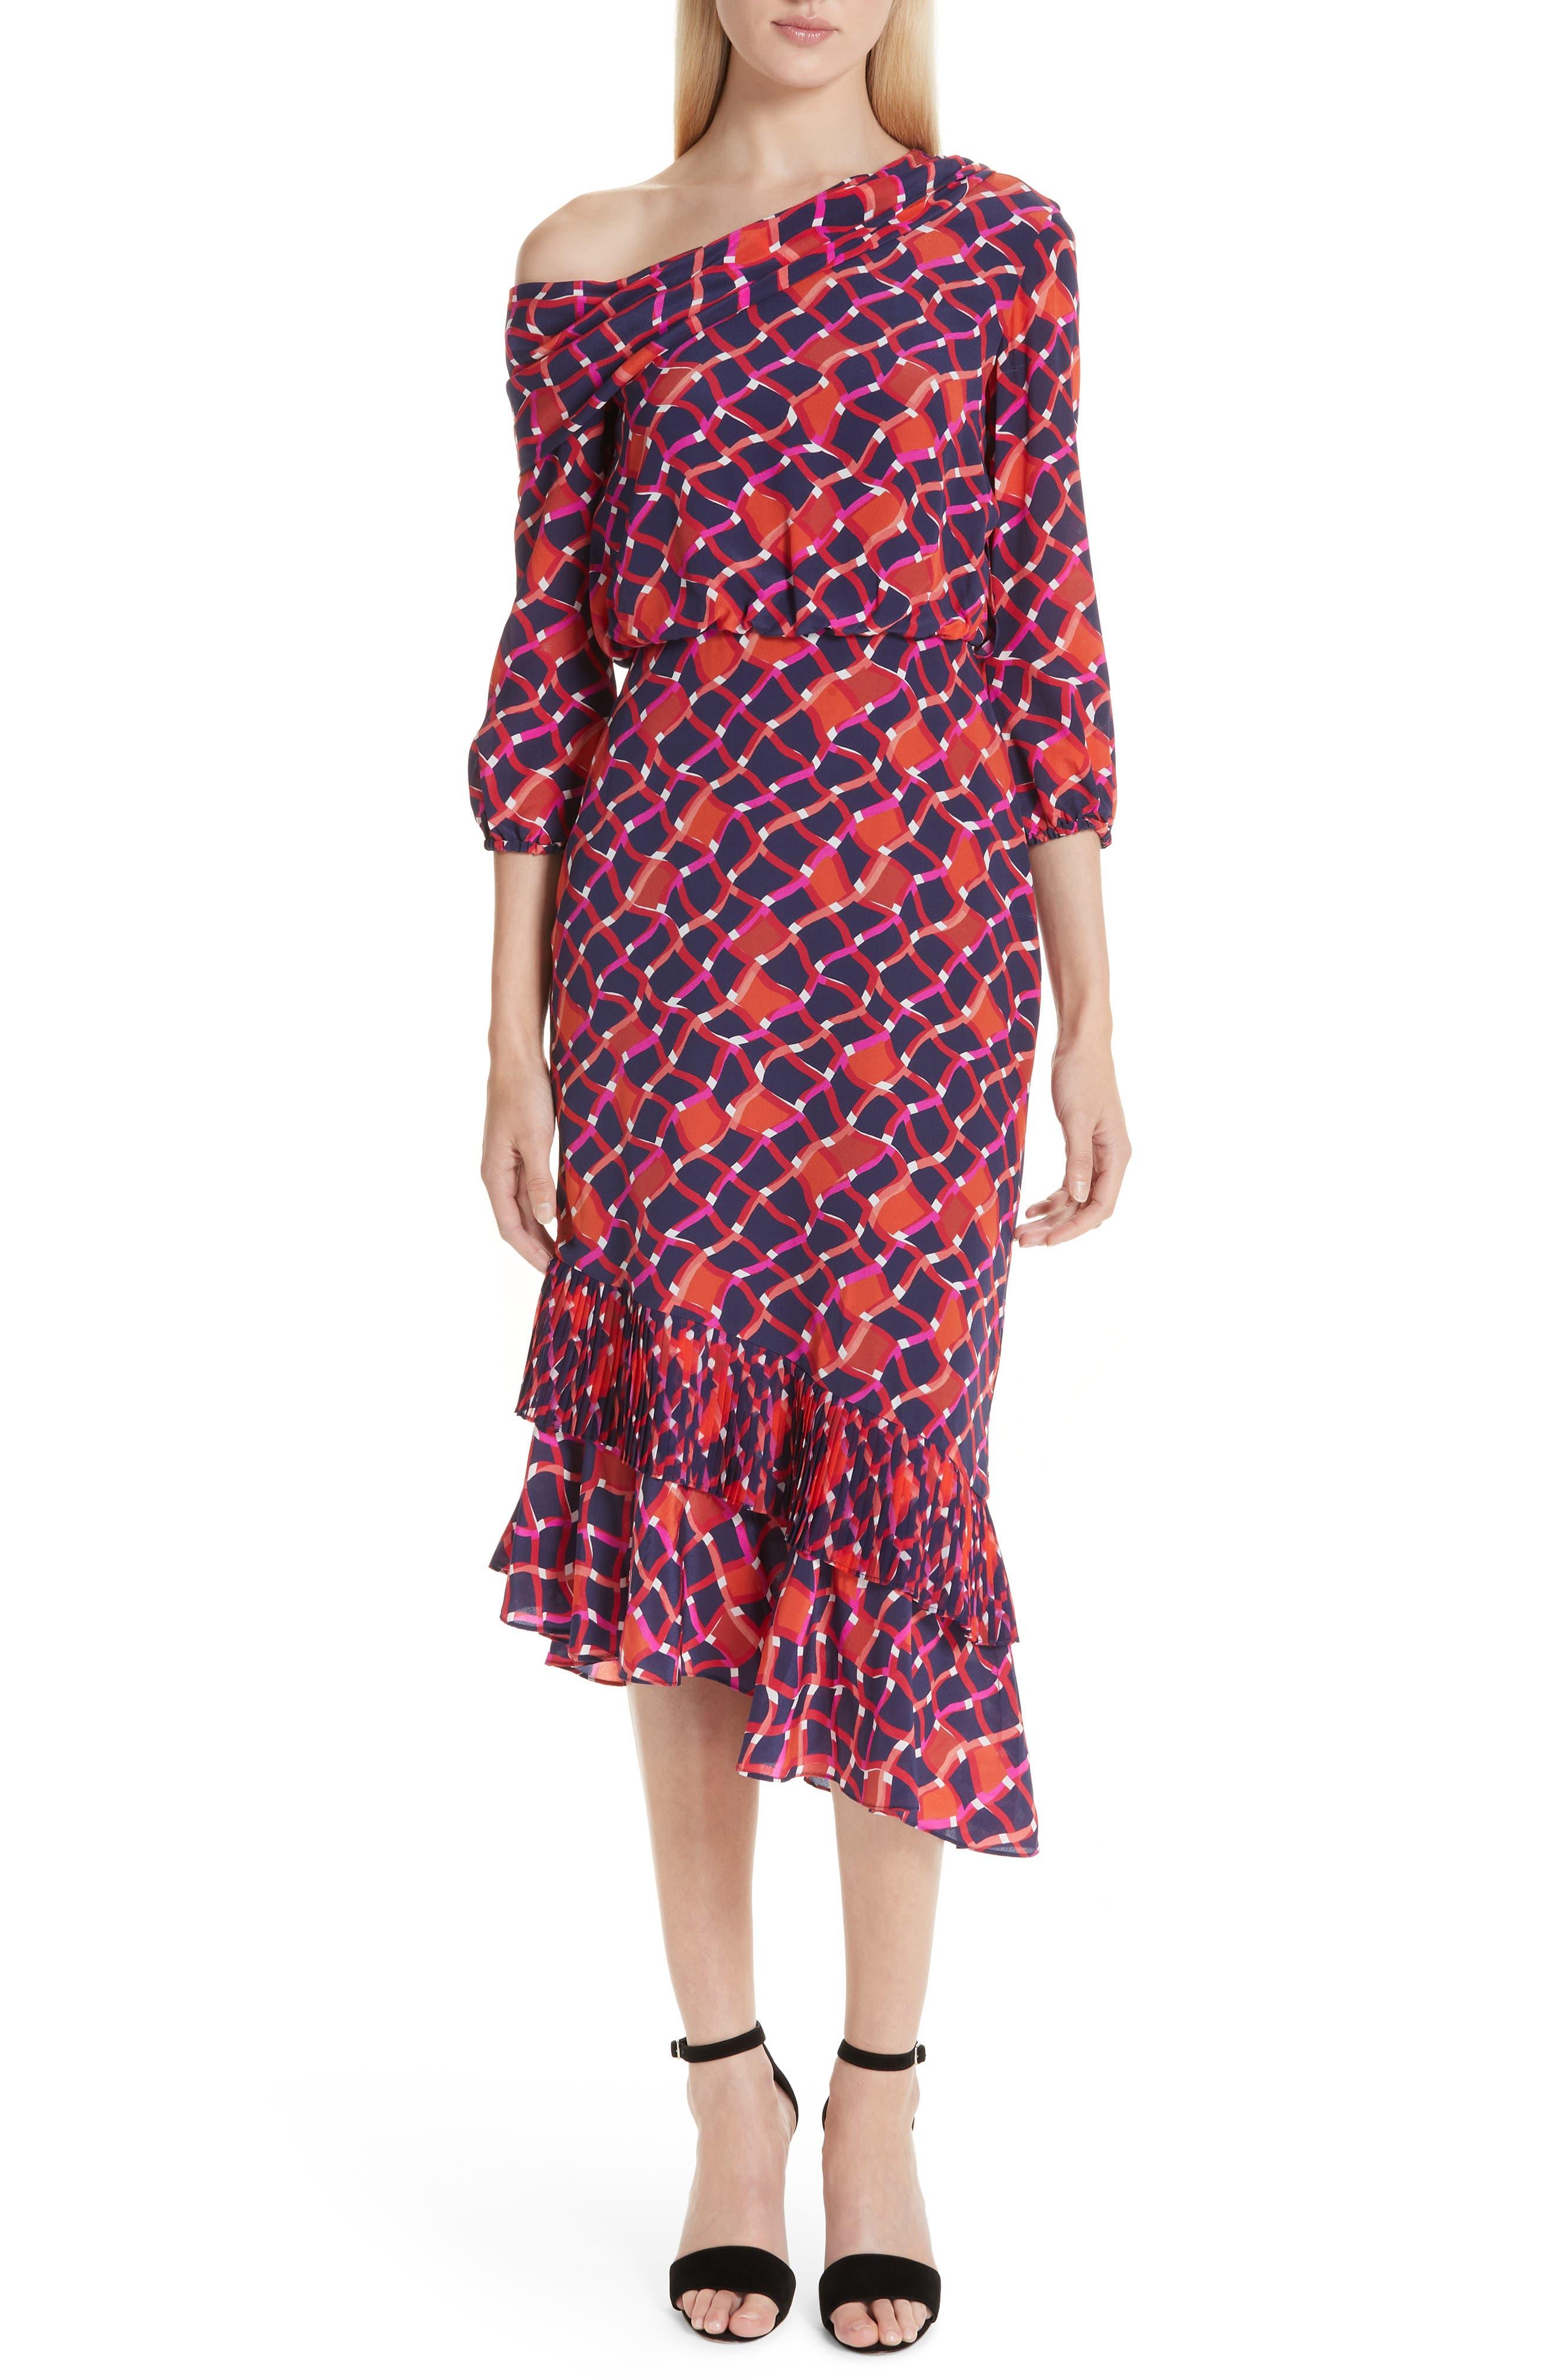 SALONI, Lexie Silk Asymmetrical Dress, Main thumbnail 1, color, MAZE